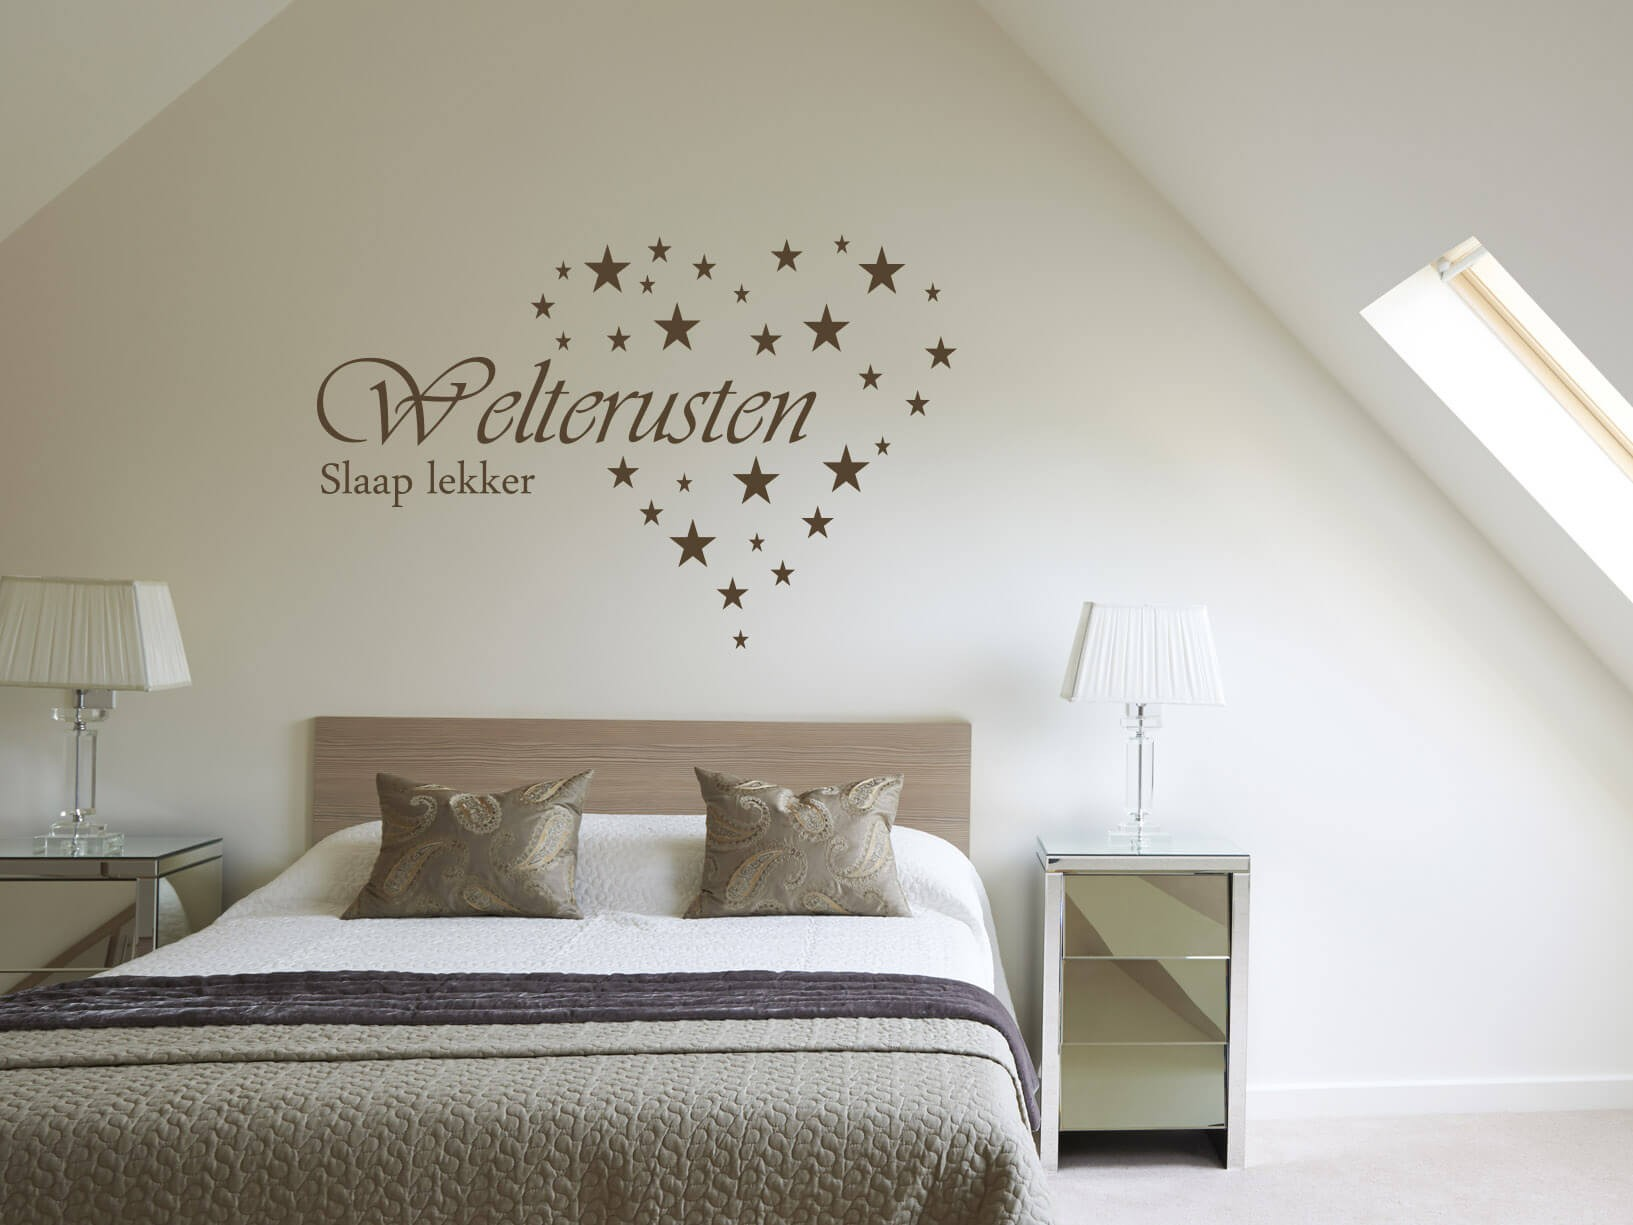 https://www.meermetstickers.nl/media/catalog/product/cache/1/image/9df78eab33525d08d6e5fb8d27136e95/w/e/welterusten-sterren-sfeer.jpg